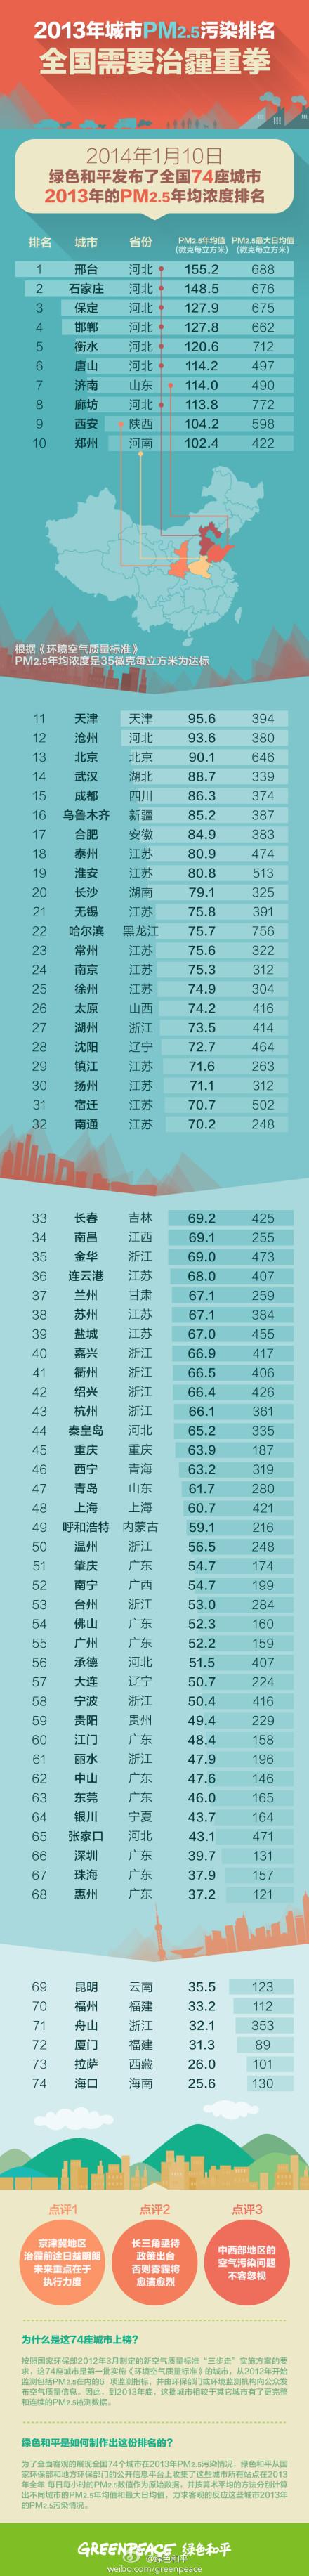 "Minitrue: Delete ""Beijing Nearly Uninhabitable"""